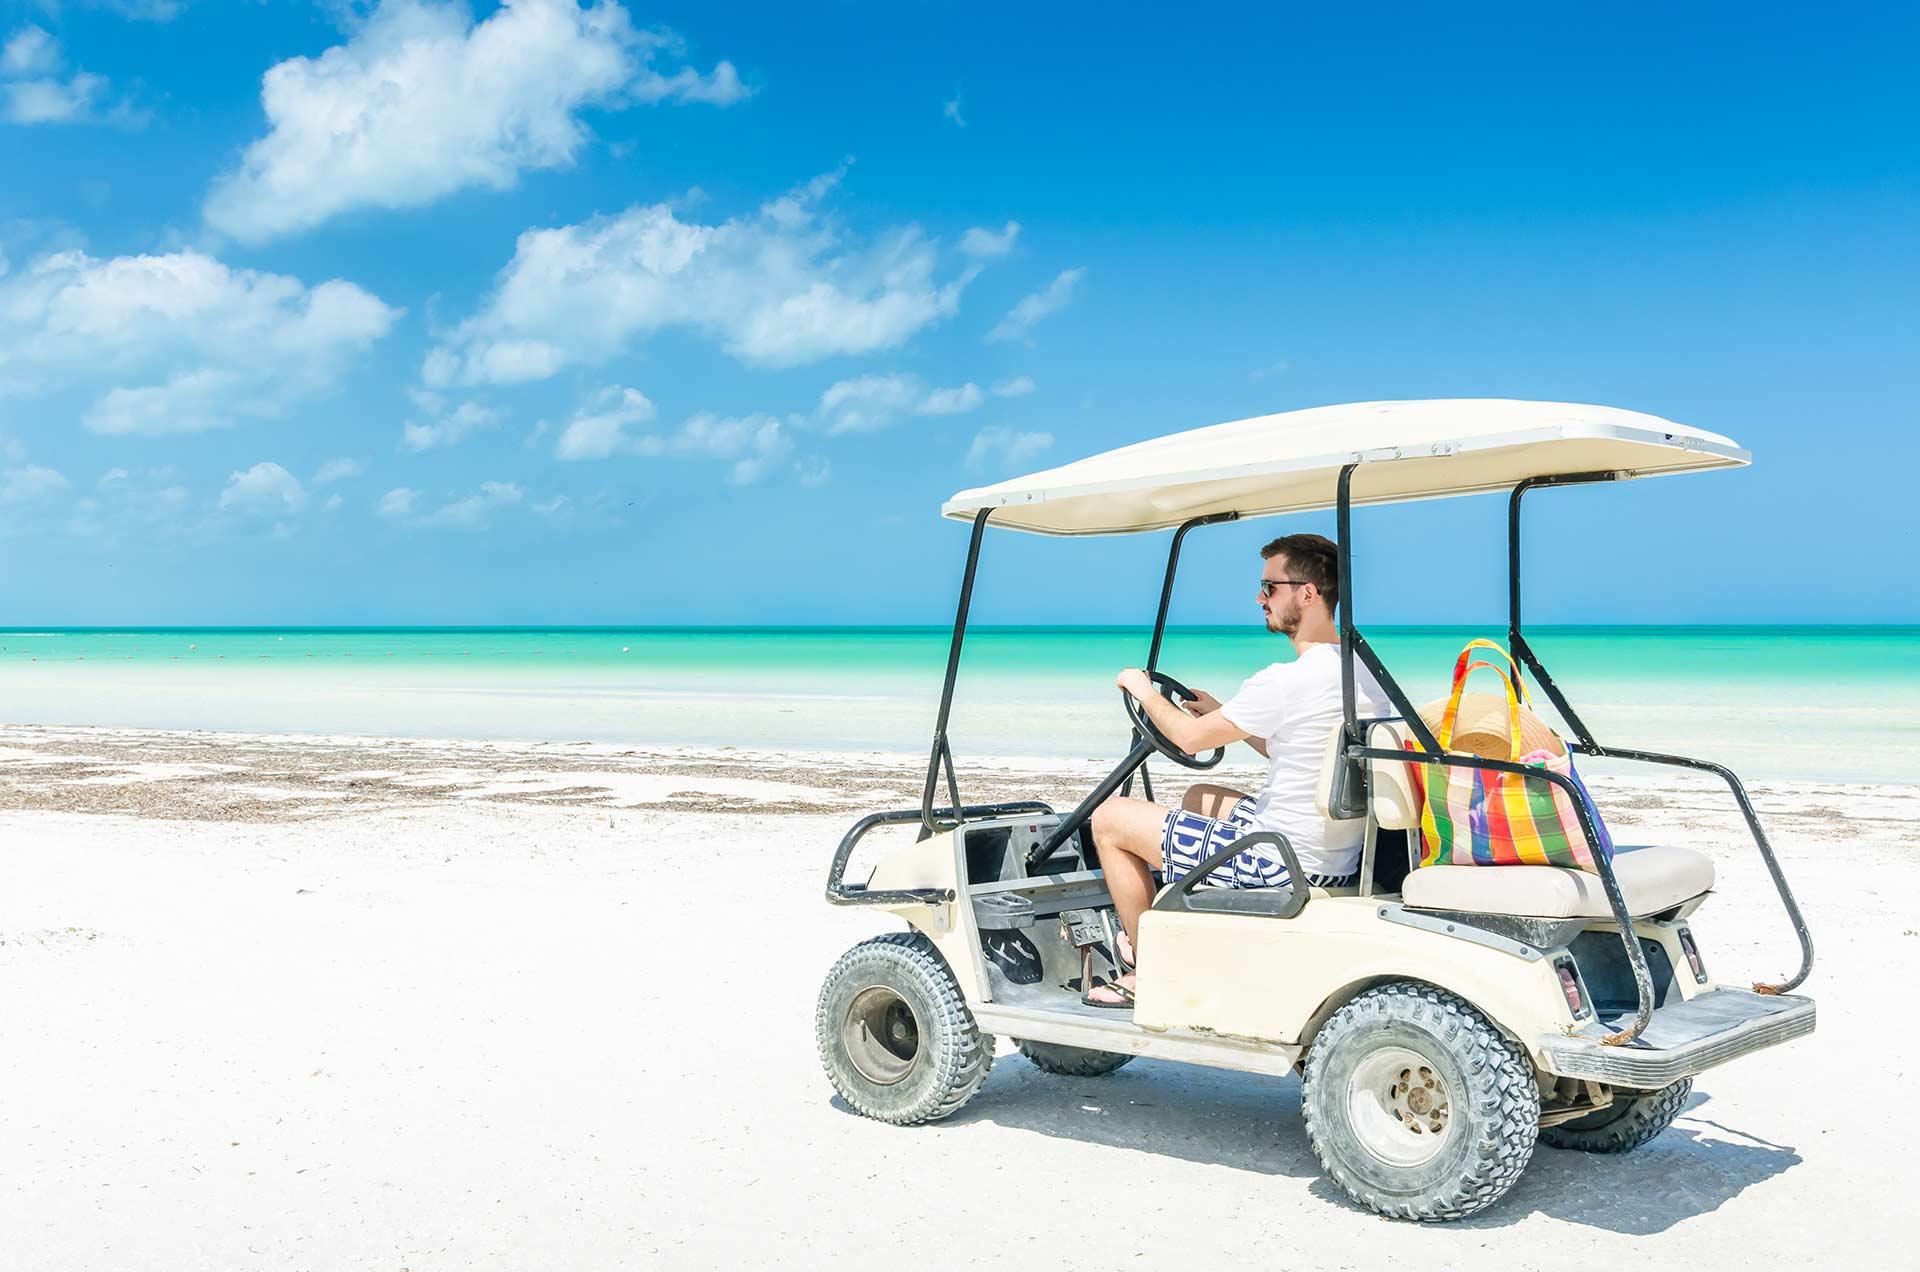 cars and carts rental